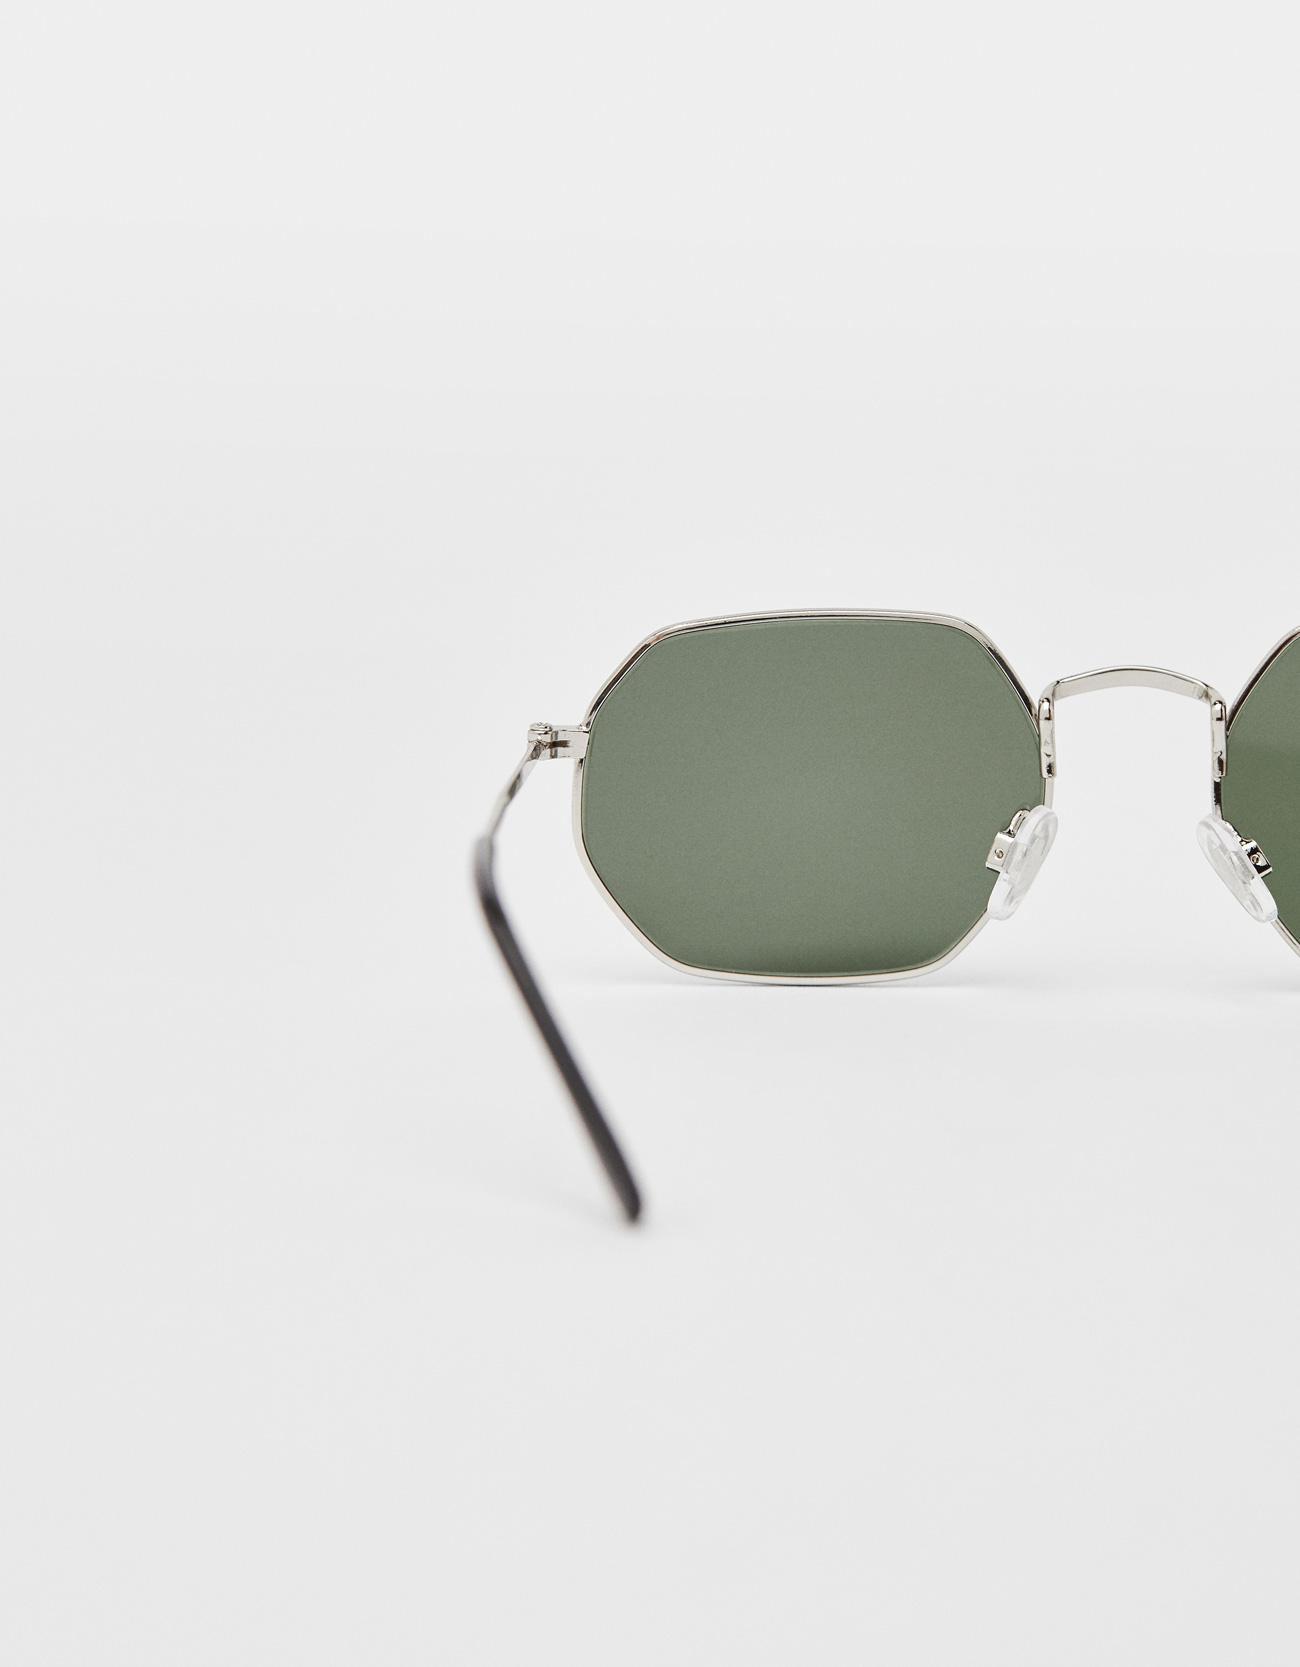 e55a81d2f3 Hexagonal sunglasses  Hexagonal sunglasses  Hexagonal sunglasses  Hexagonal  sunglasses  Hexagonal sunglasses